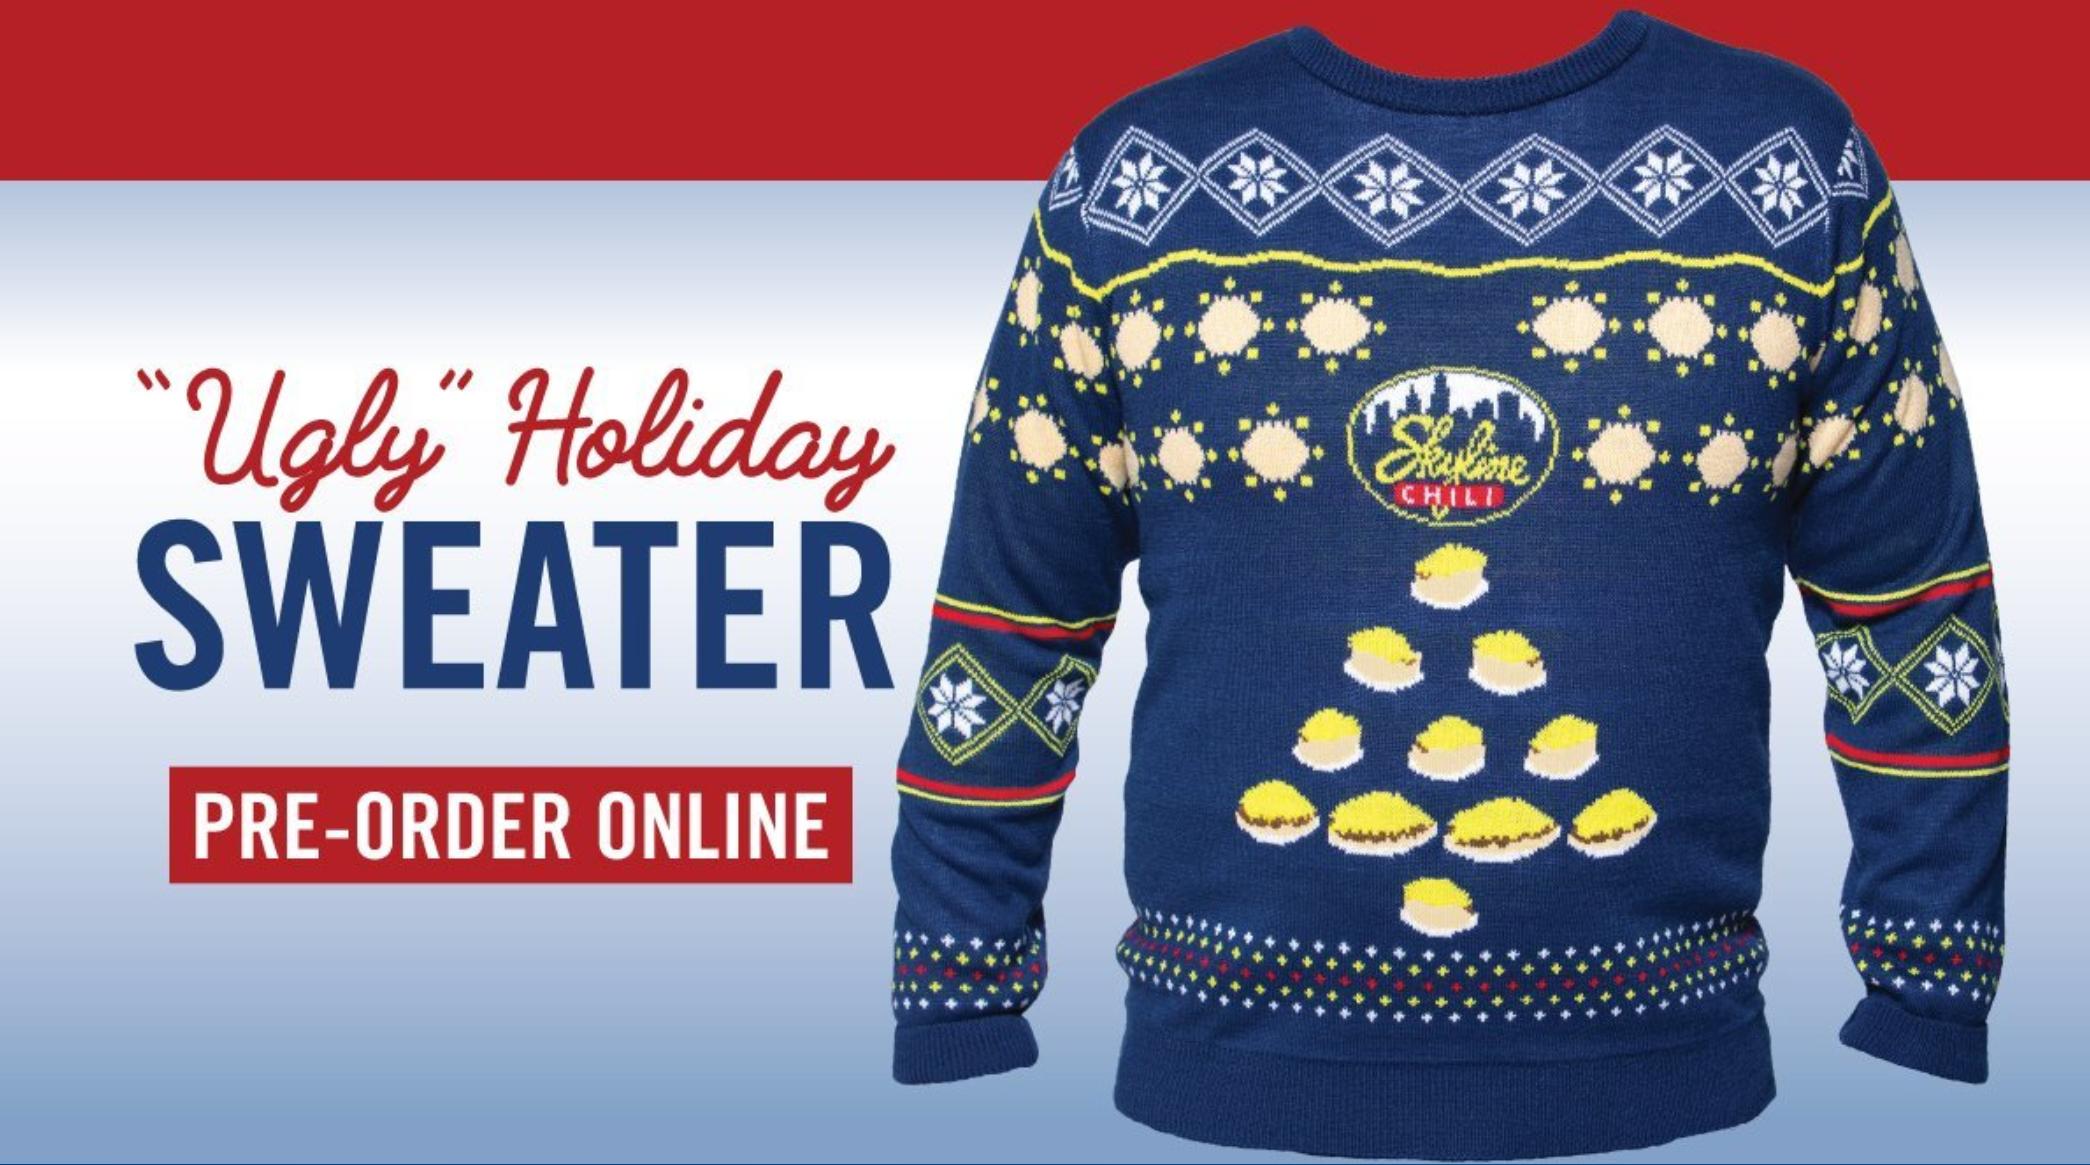 Skyline Chili Sells Chili Themed Ugly Holiday Sweater